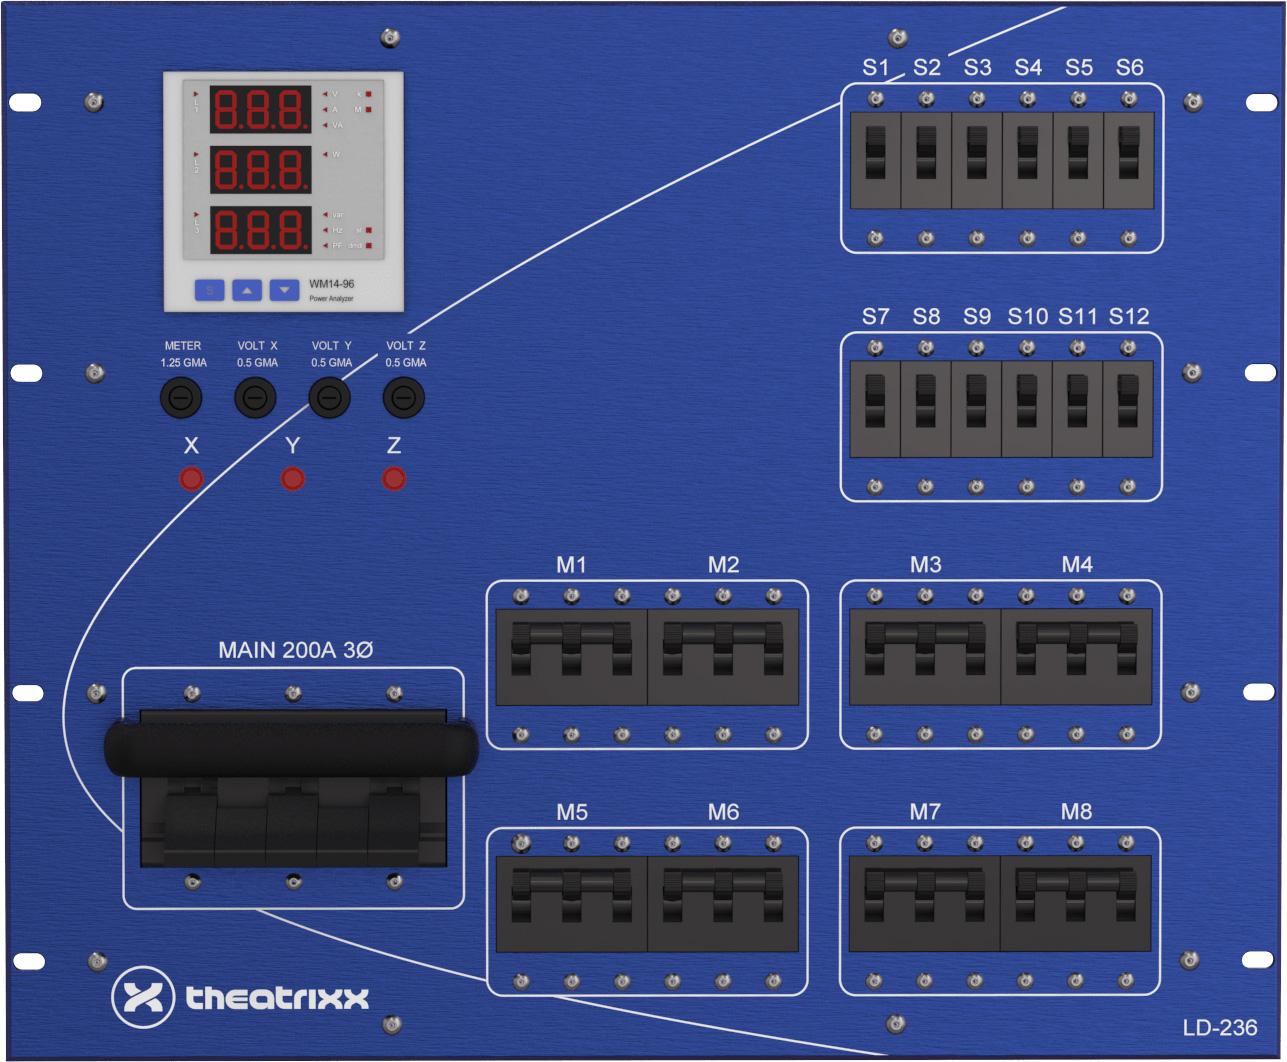 Theatrixx LD236B 200A 120/208V Main Breaker on CAM In/Thur 48x20A Electrical Distribution System - 9RU TTX-LD236B